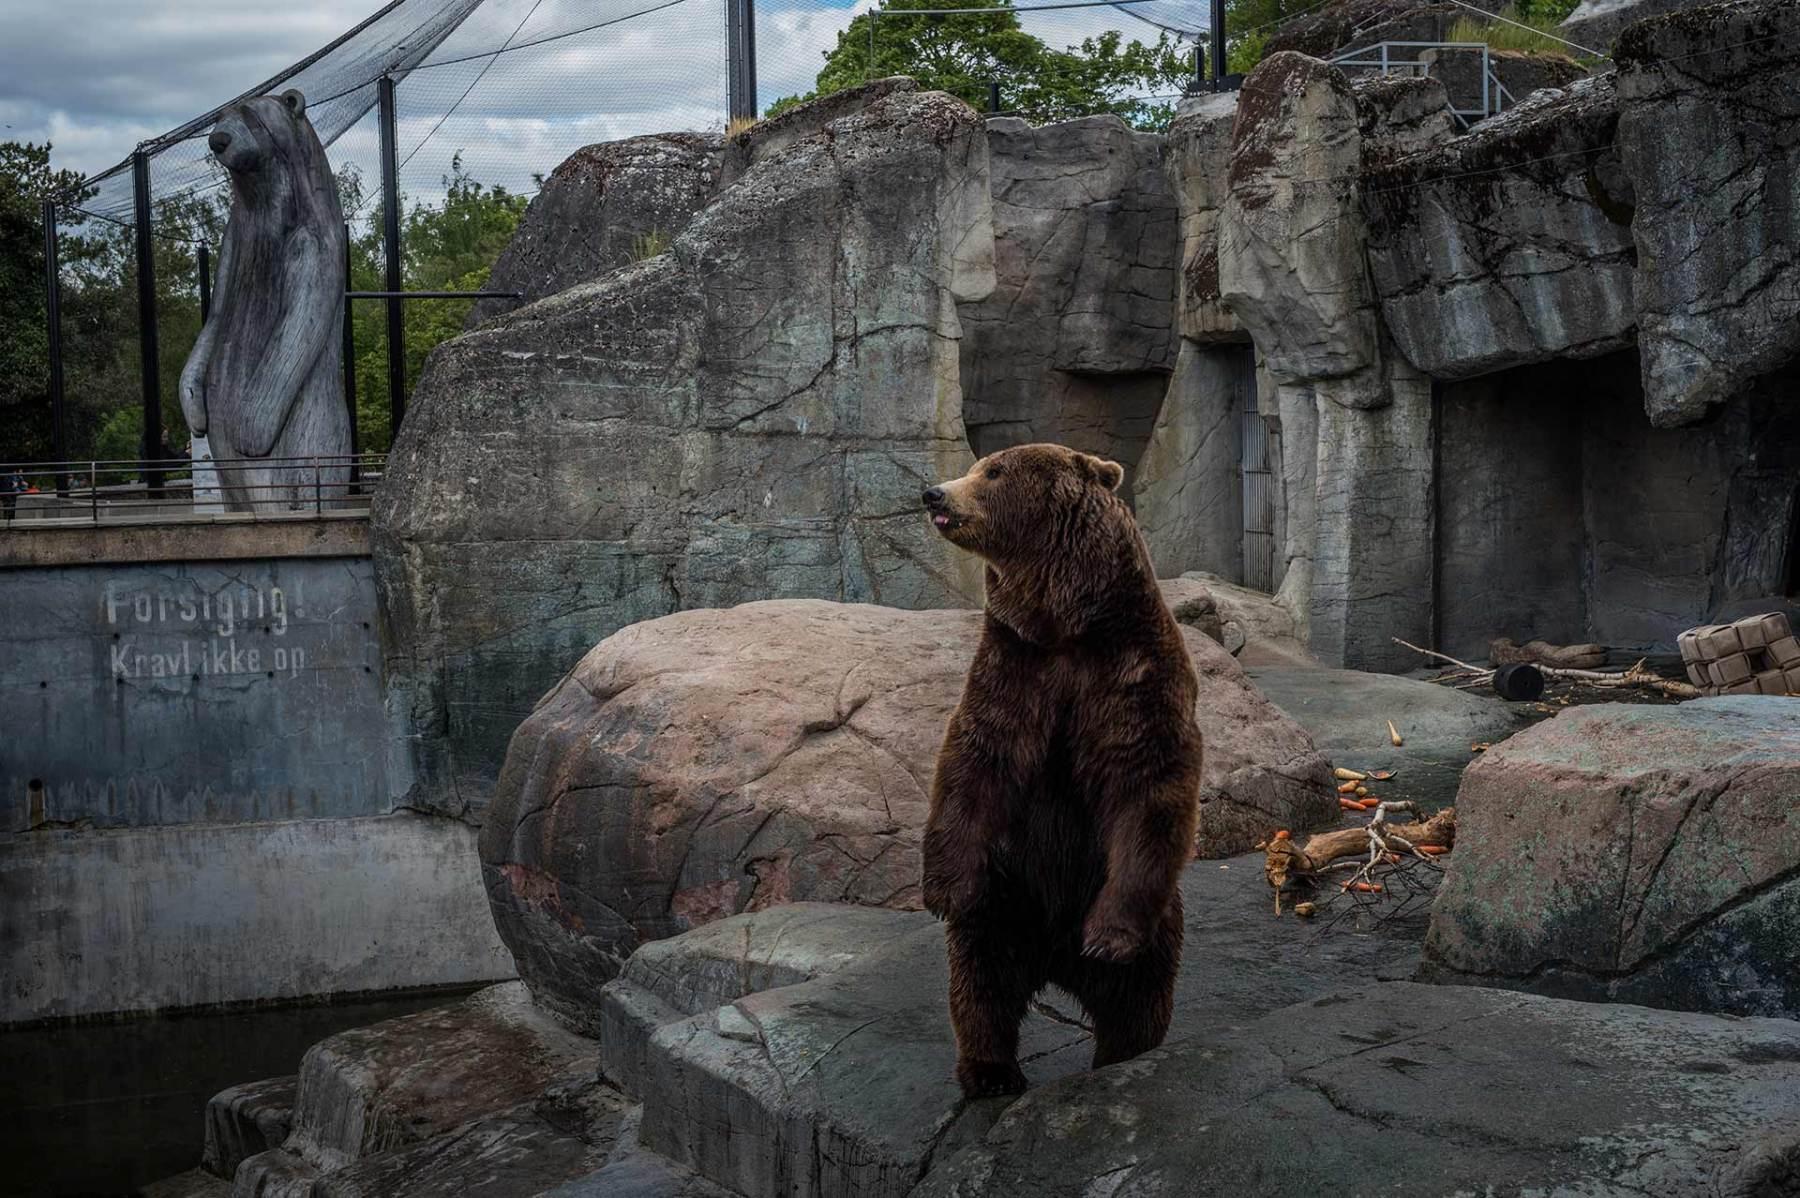 Brown bear, Denmark, 2016. JMcArthur/Born Free Foundation